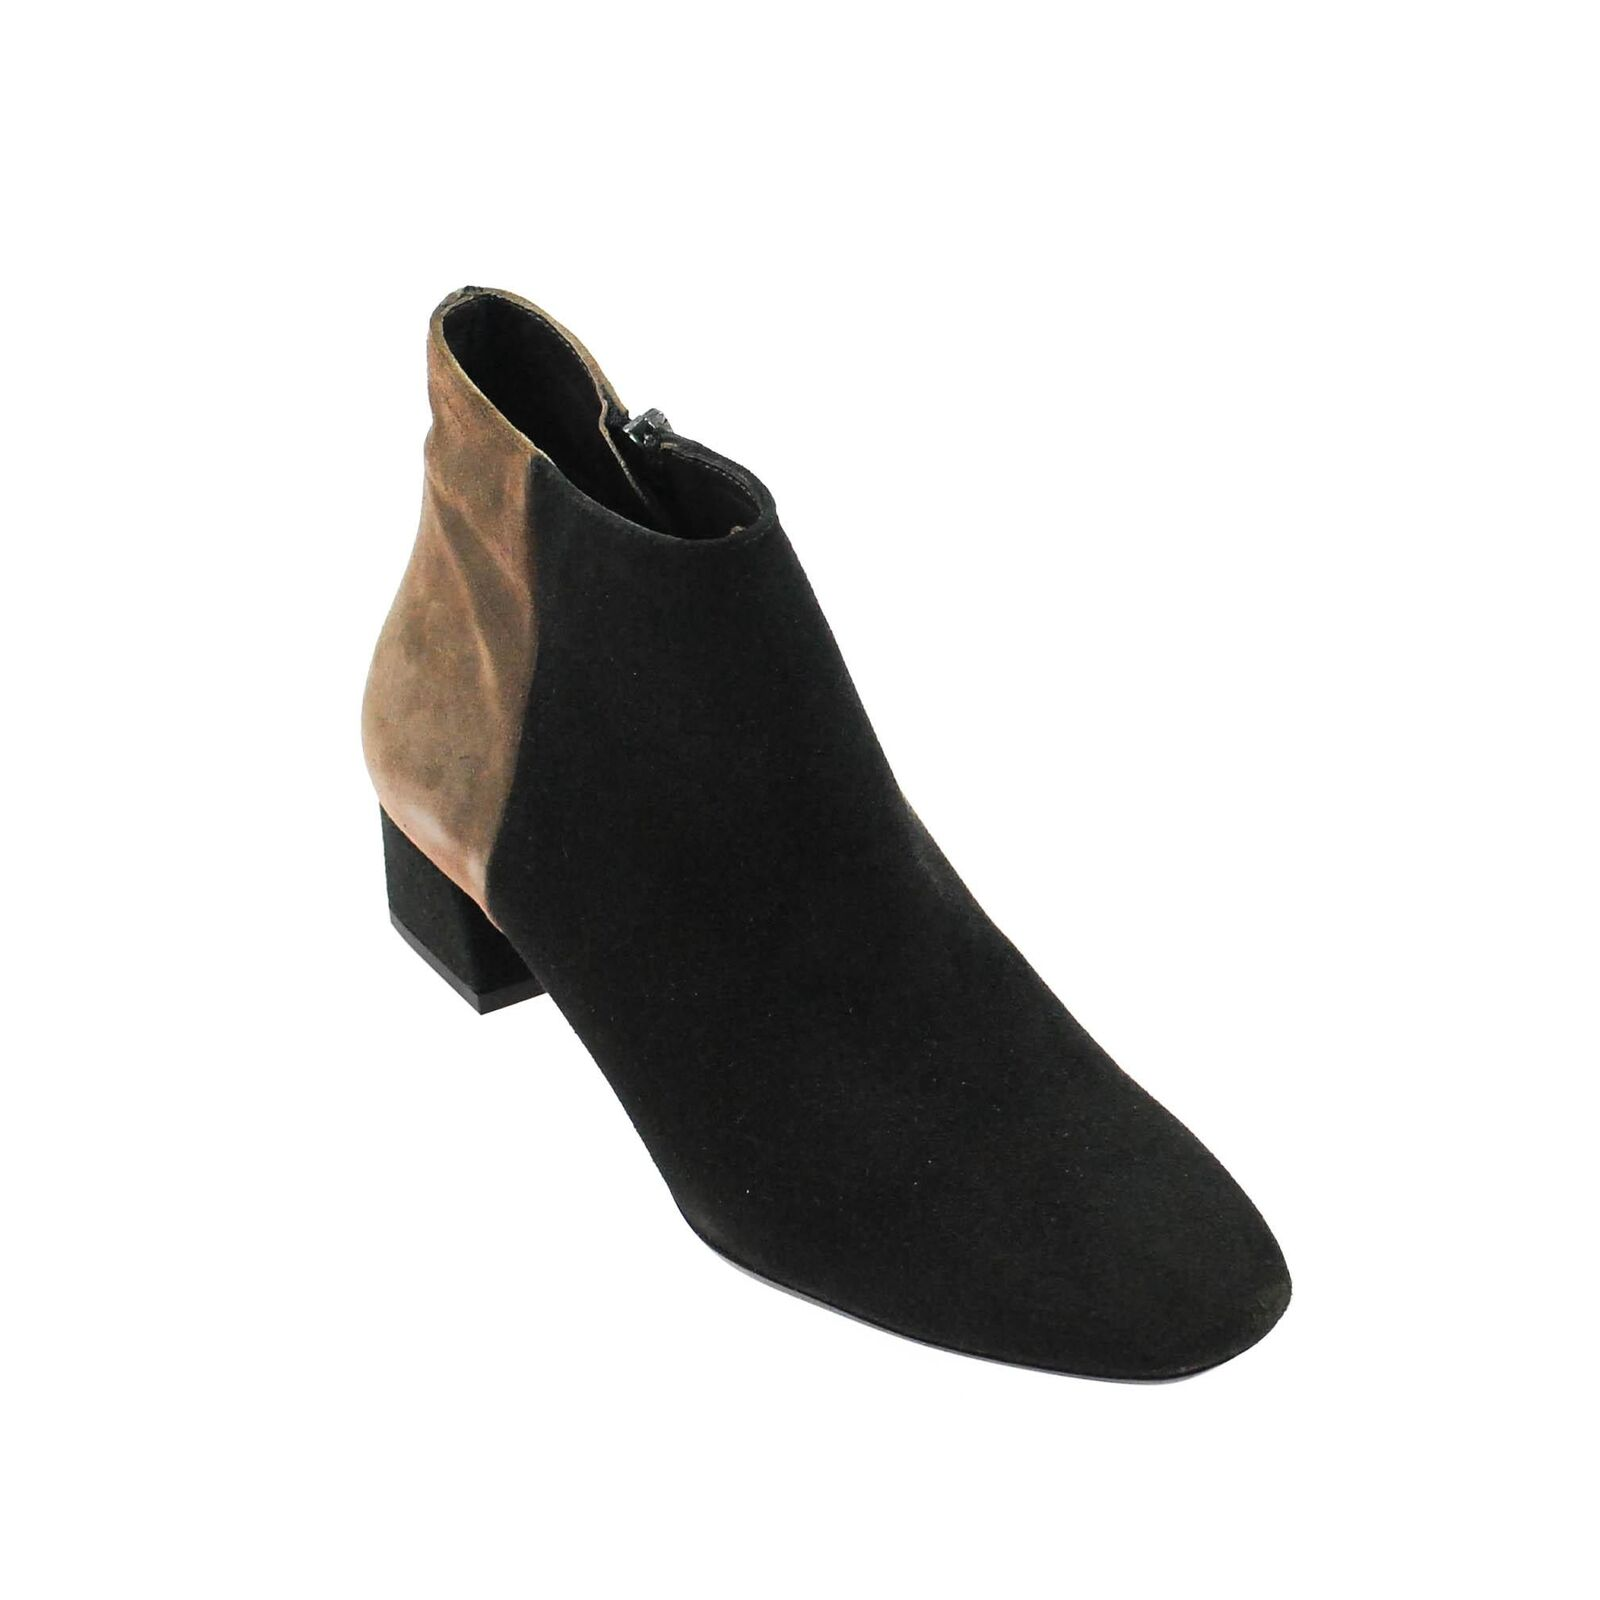 Perlato señora botín de gamuza marrón negro